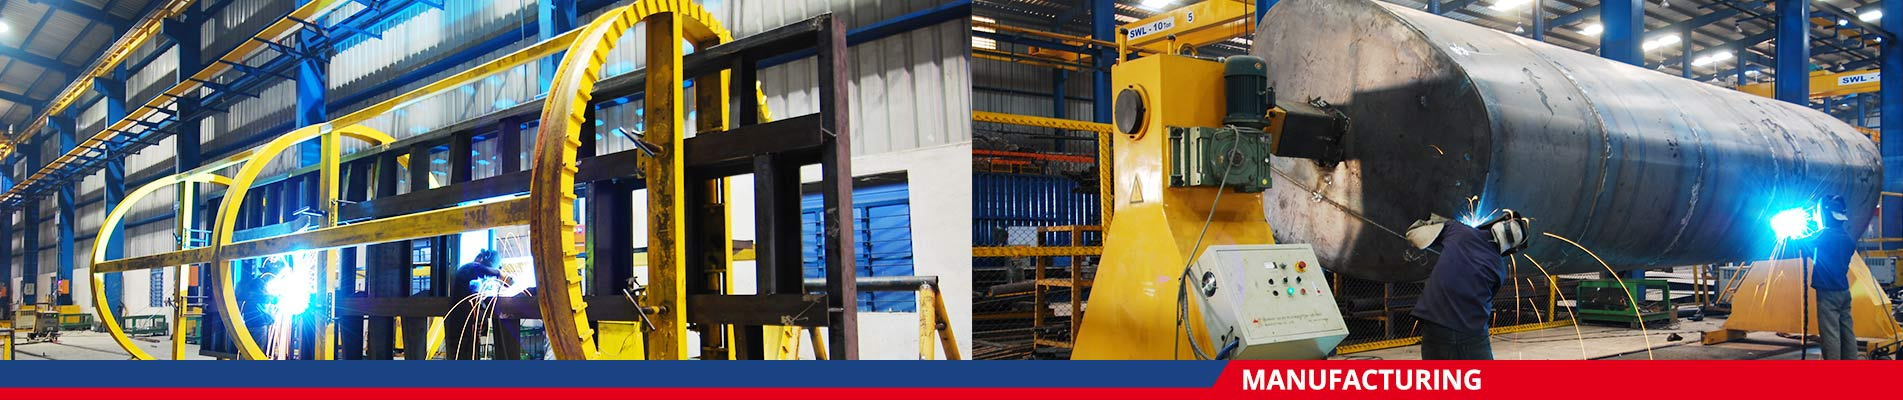 Satrac Manufacturing